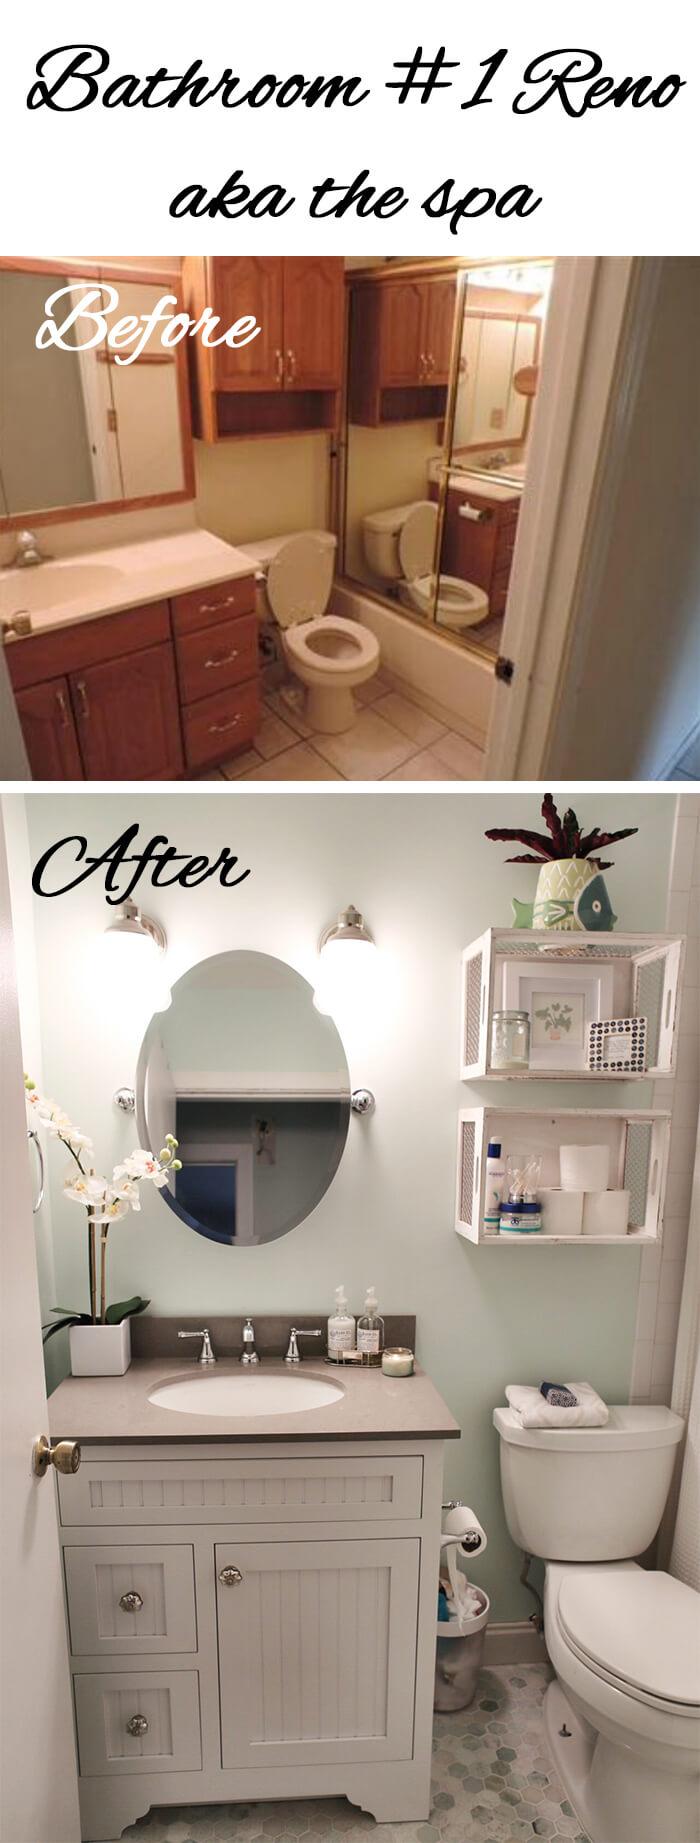 28 Best Budget Friendly Bathroom Makeover Ideas and ... on Bathroom Ideas On A Budget  id=91126